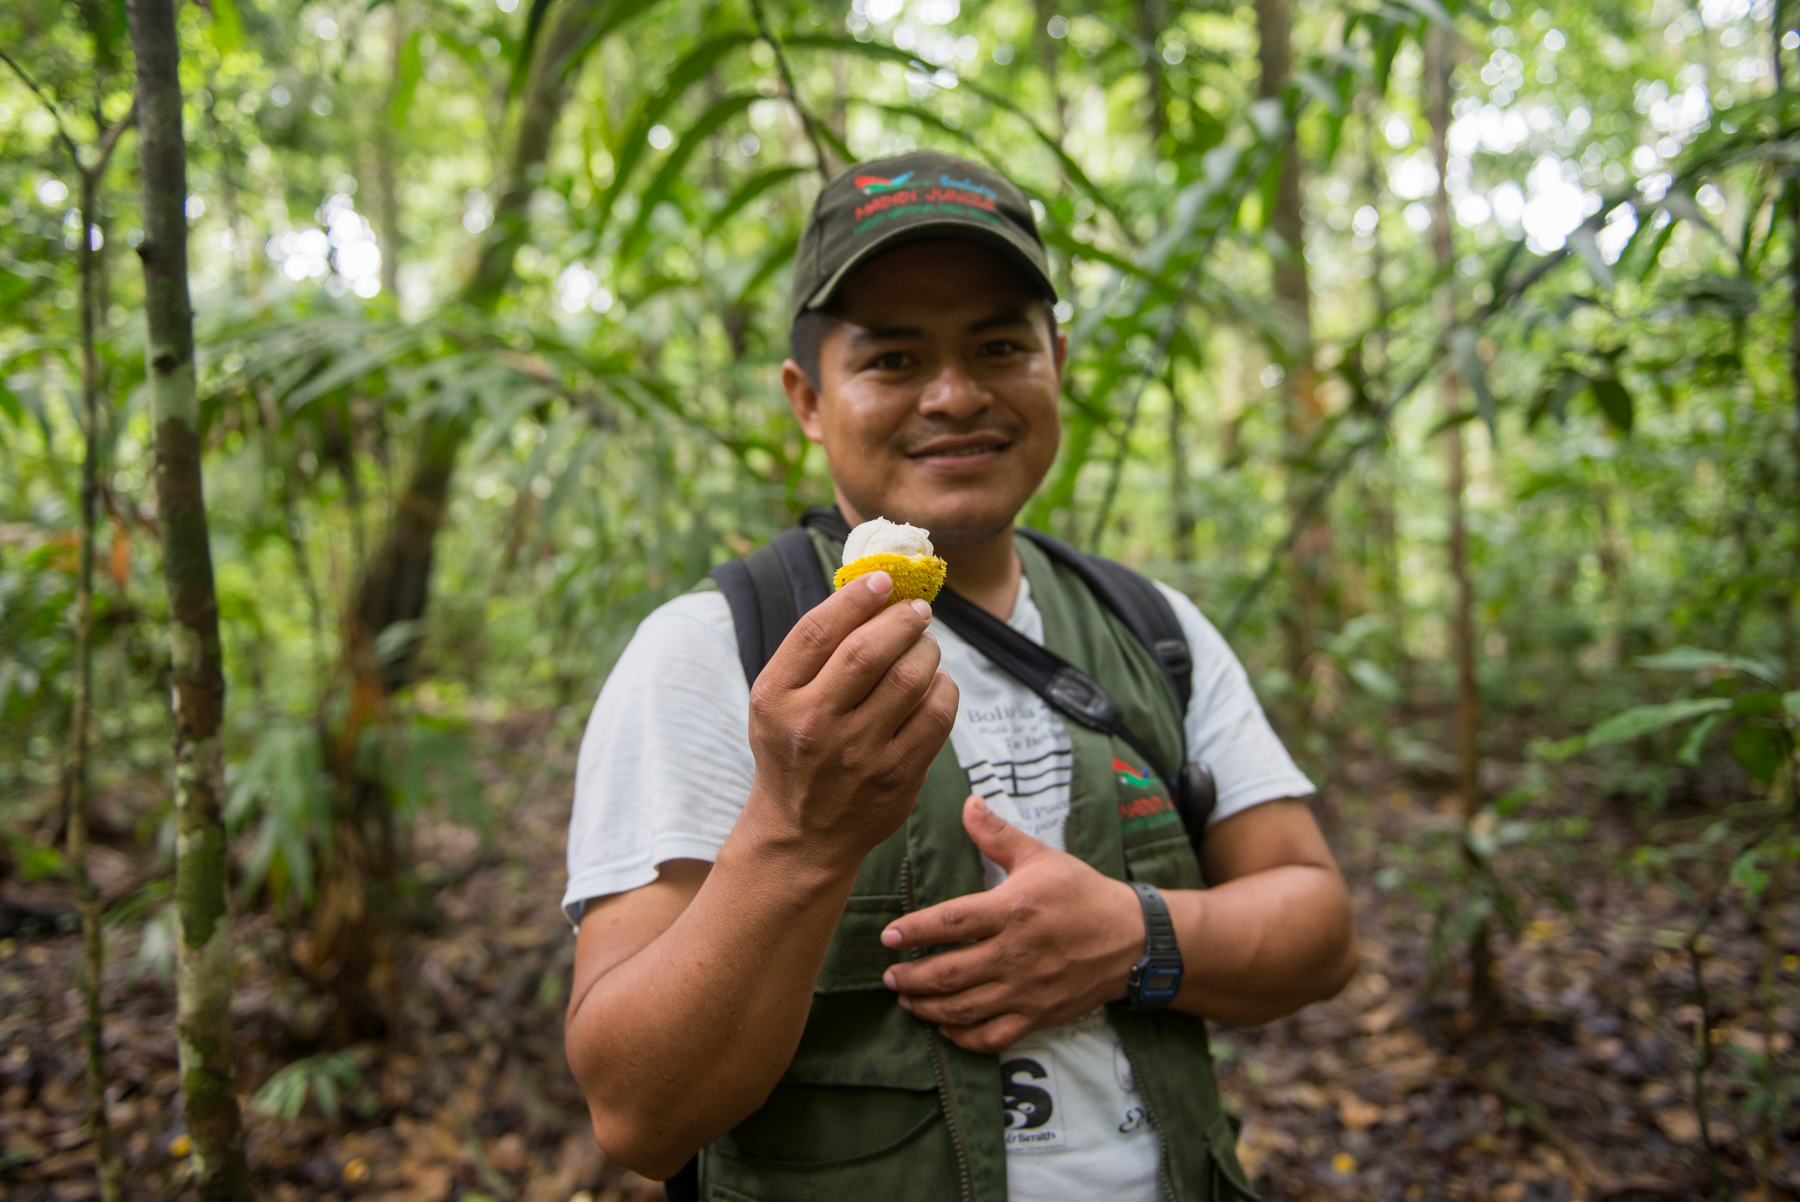 Our guide at Madidi Jungle Ecolodge, Orlando